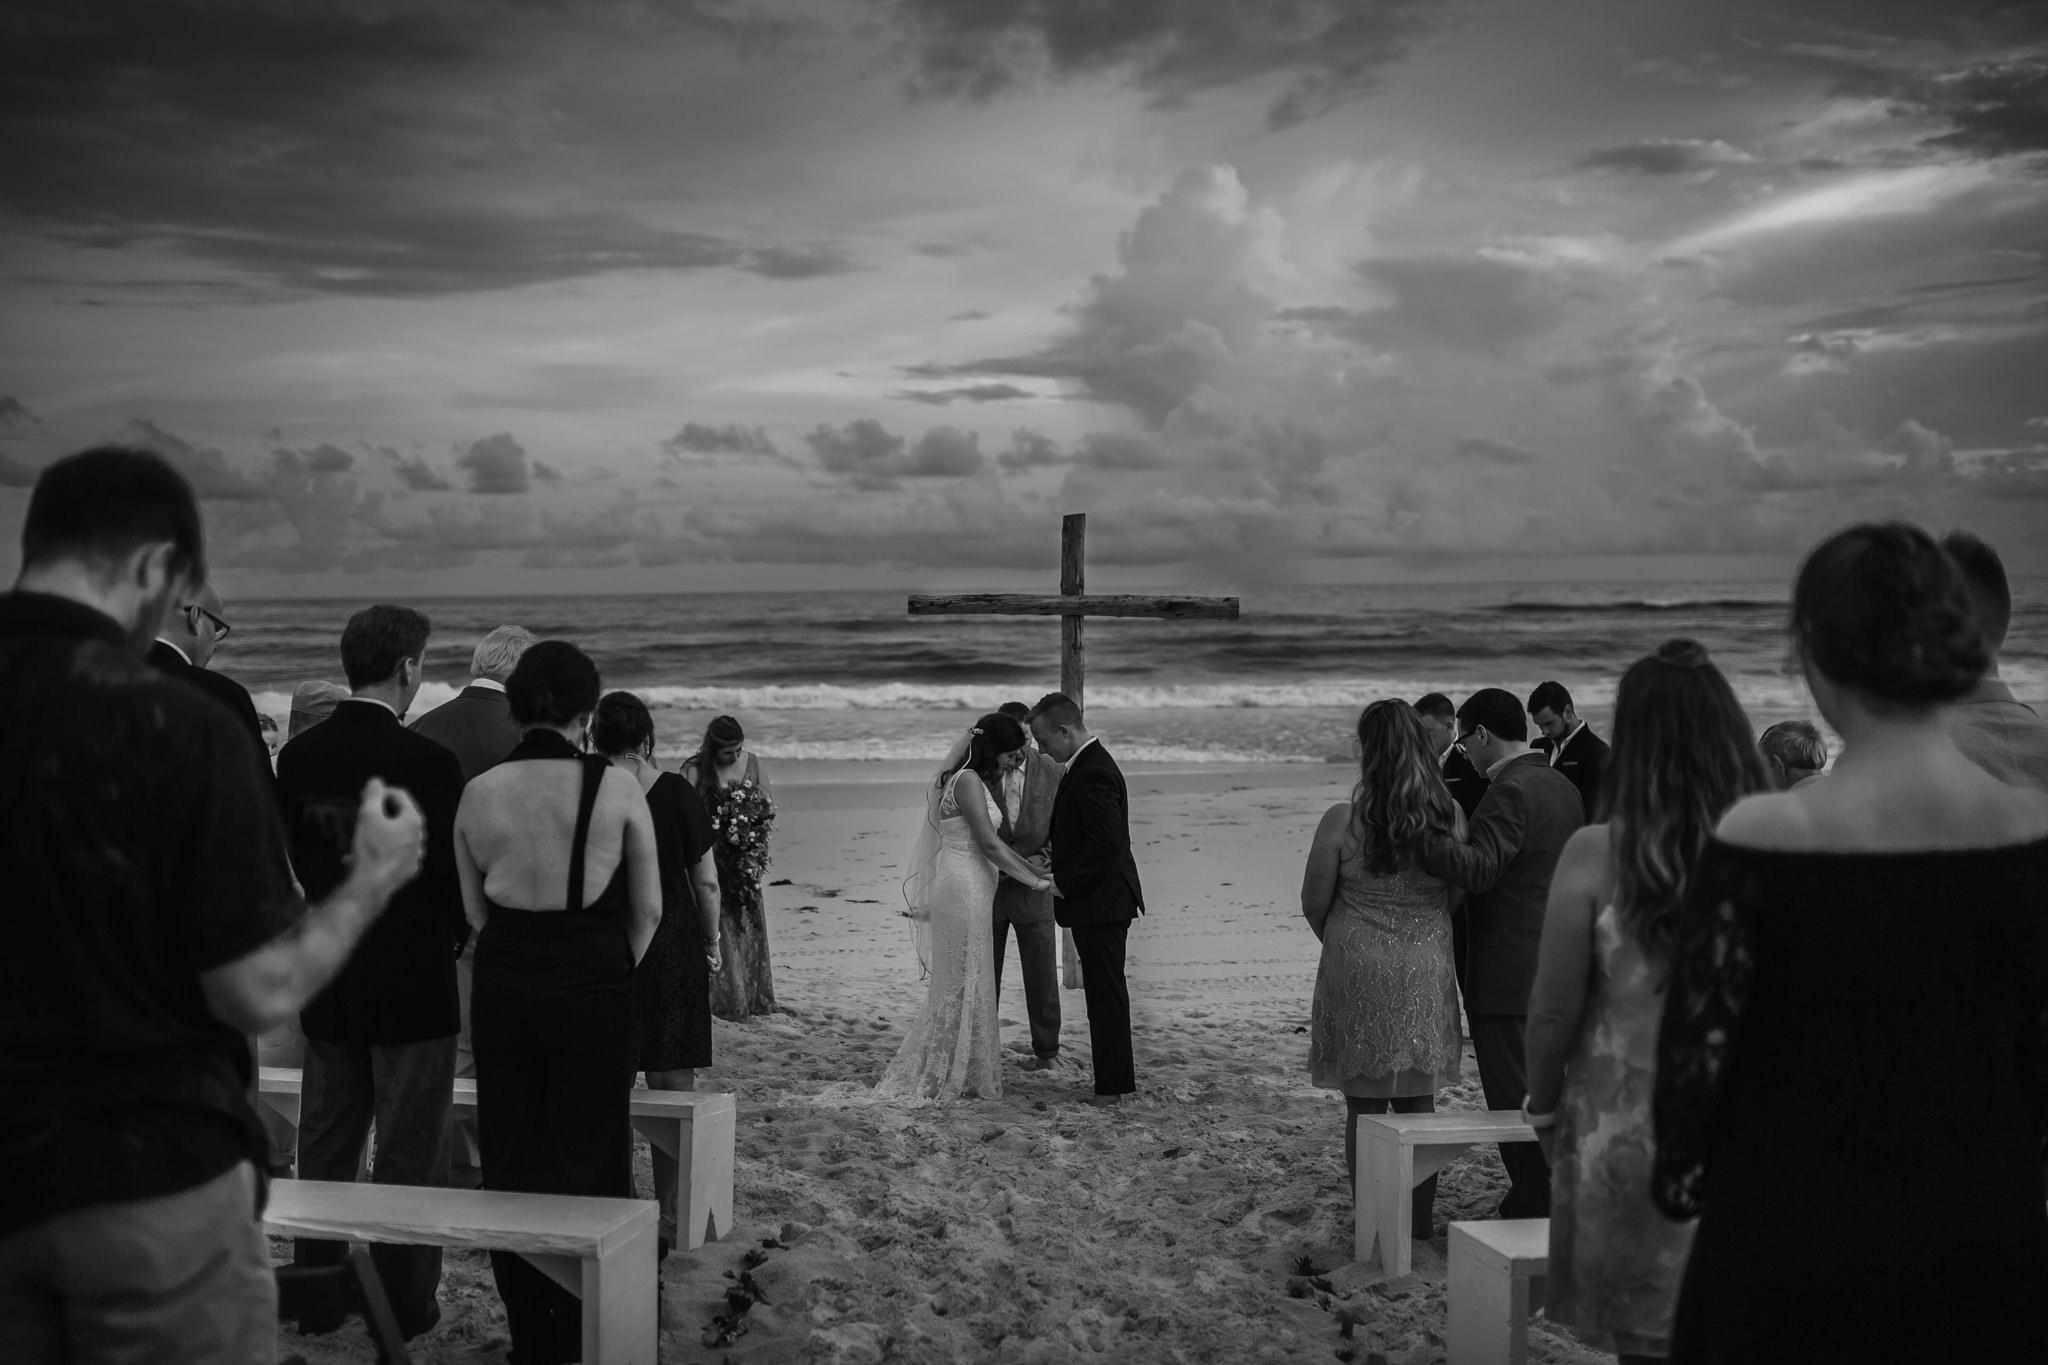 cassie-cook-photography-santa-rosa-beach-wedding-farrar-wedding-65.jpg